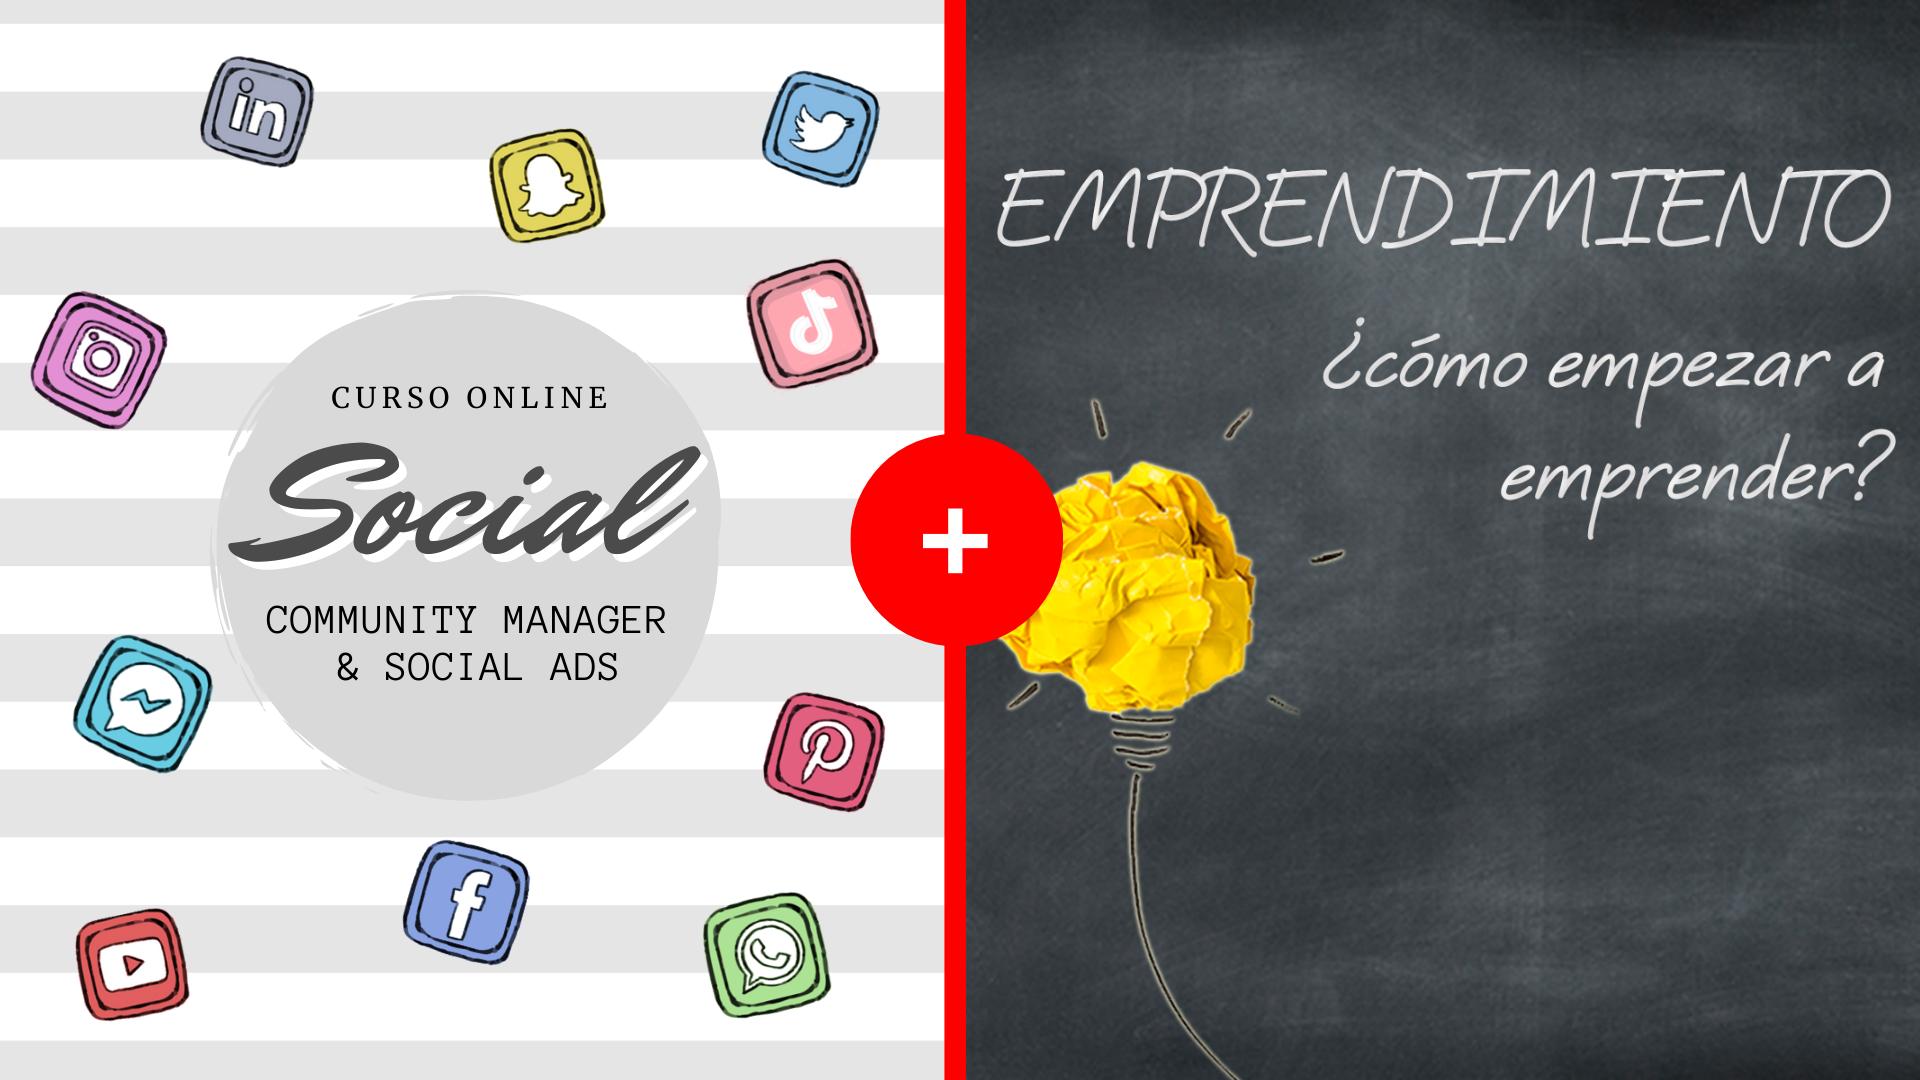 Curso de Social Full + Emprendimiento